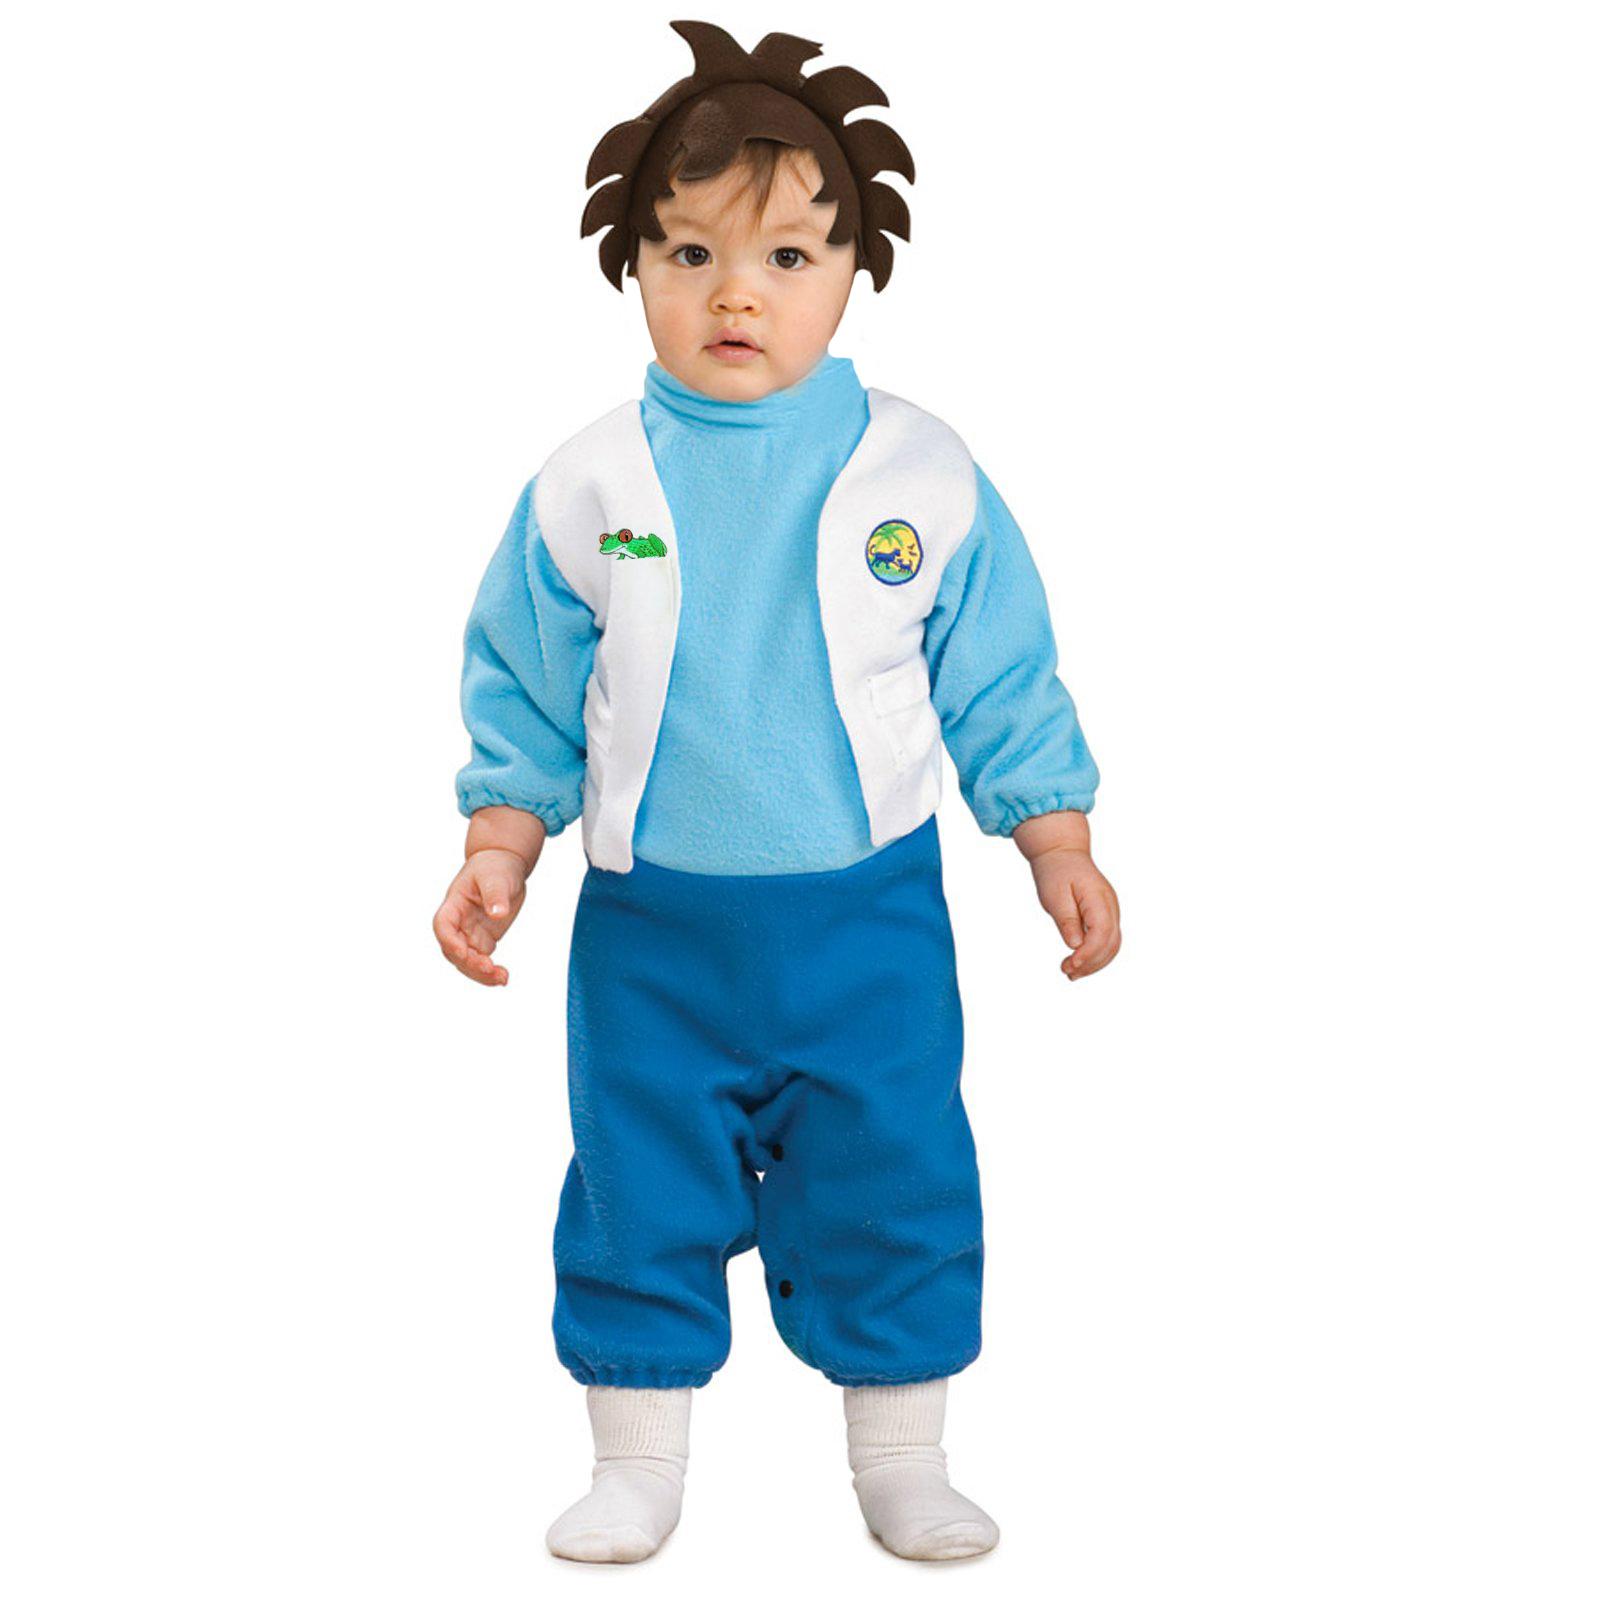 Go, Diego, Go – Diego EZ-On Romper Infant Costume